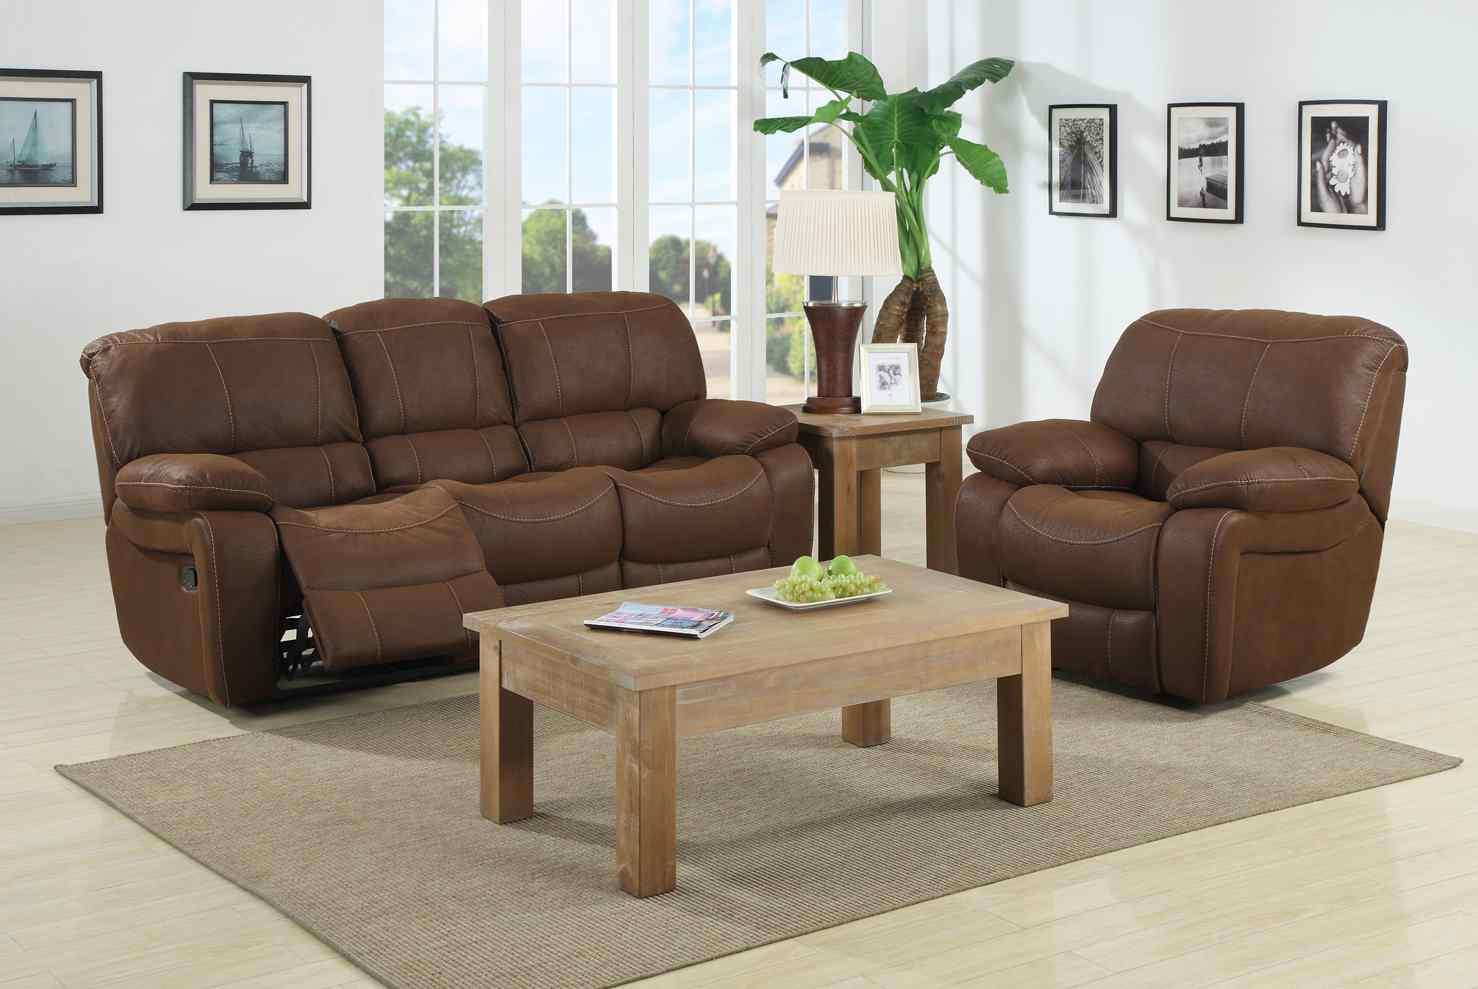 ralf hellenbrandt schreinerei pvc fenster koemmerling. Black Bedroom Furniture Sets. Home Design Ideas